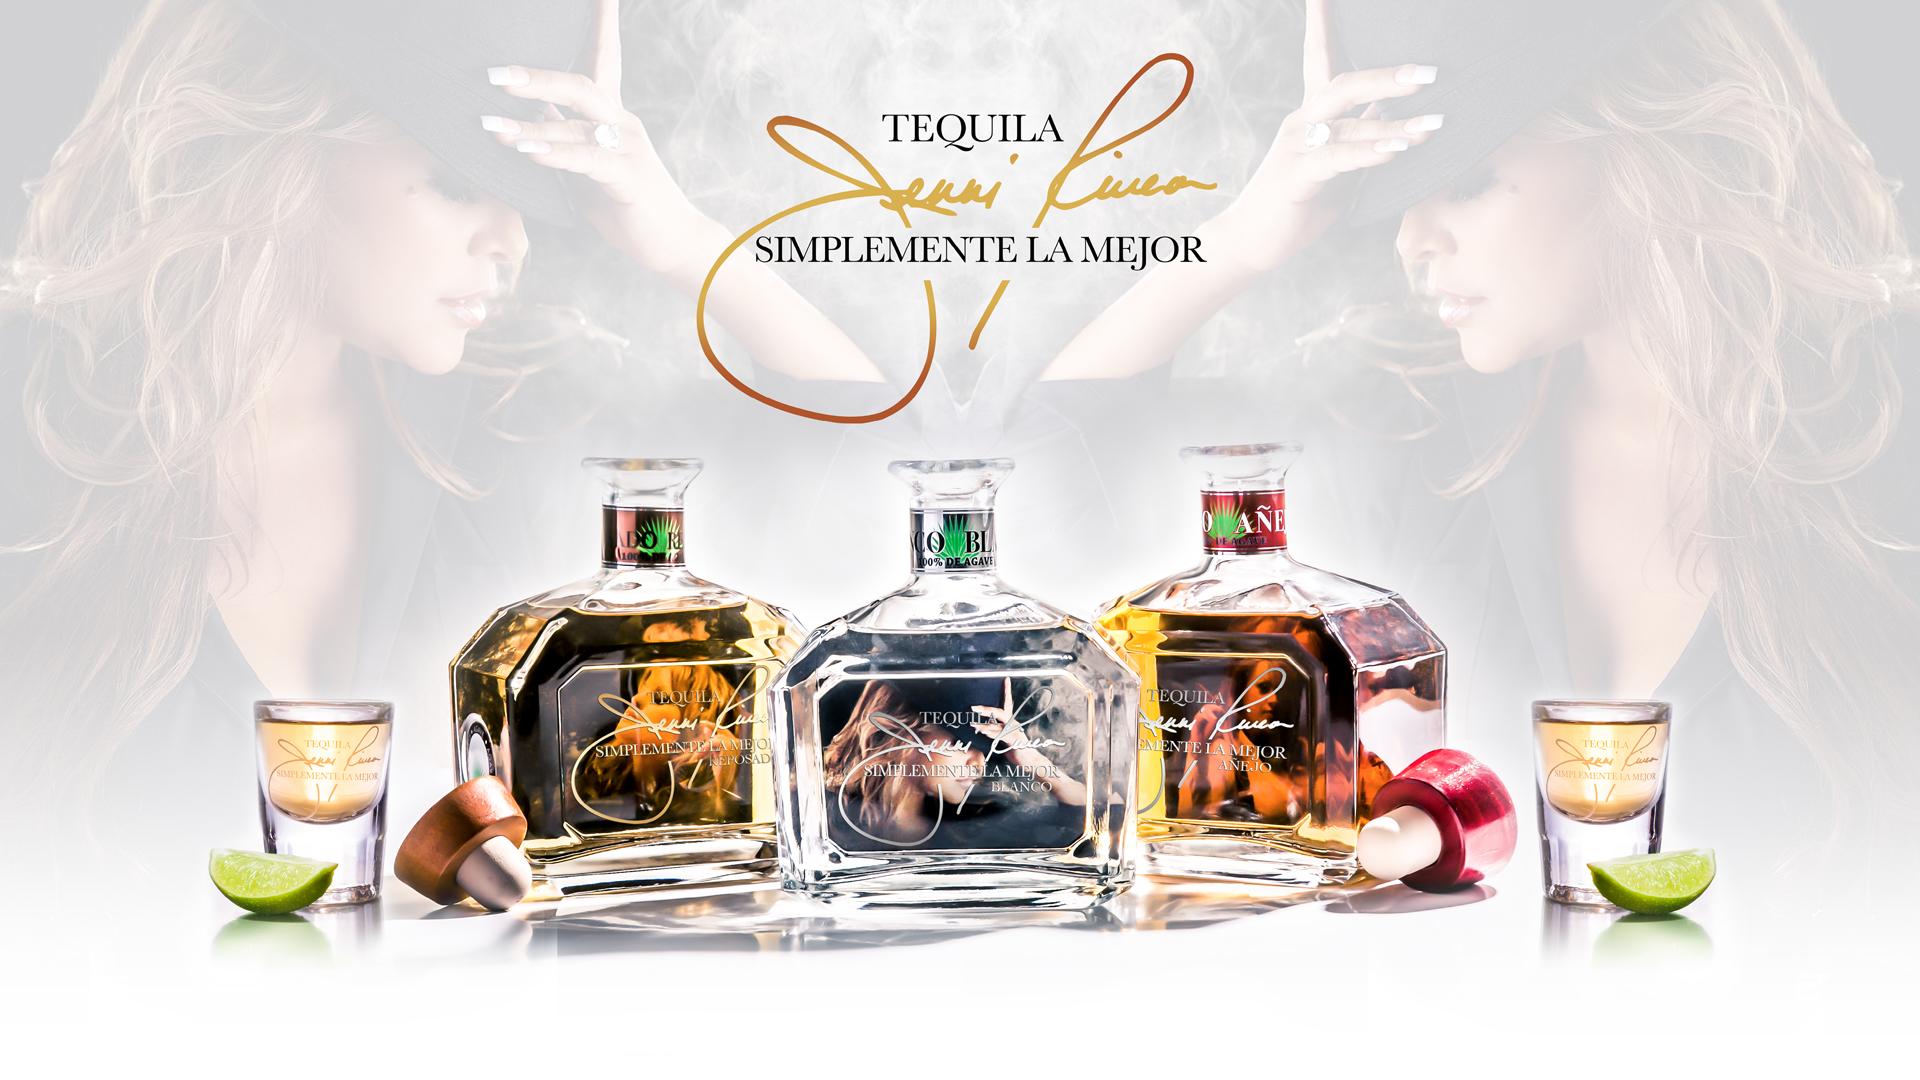 tequila-simplemente-la-mejor-online-banner.jpg